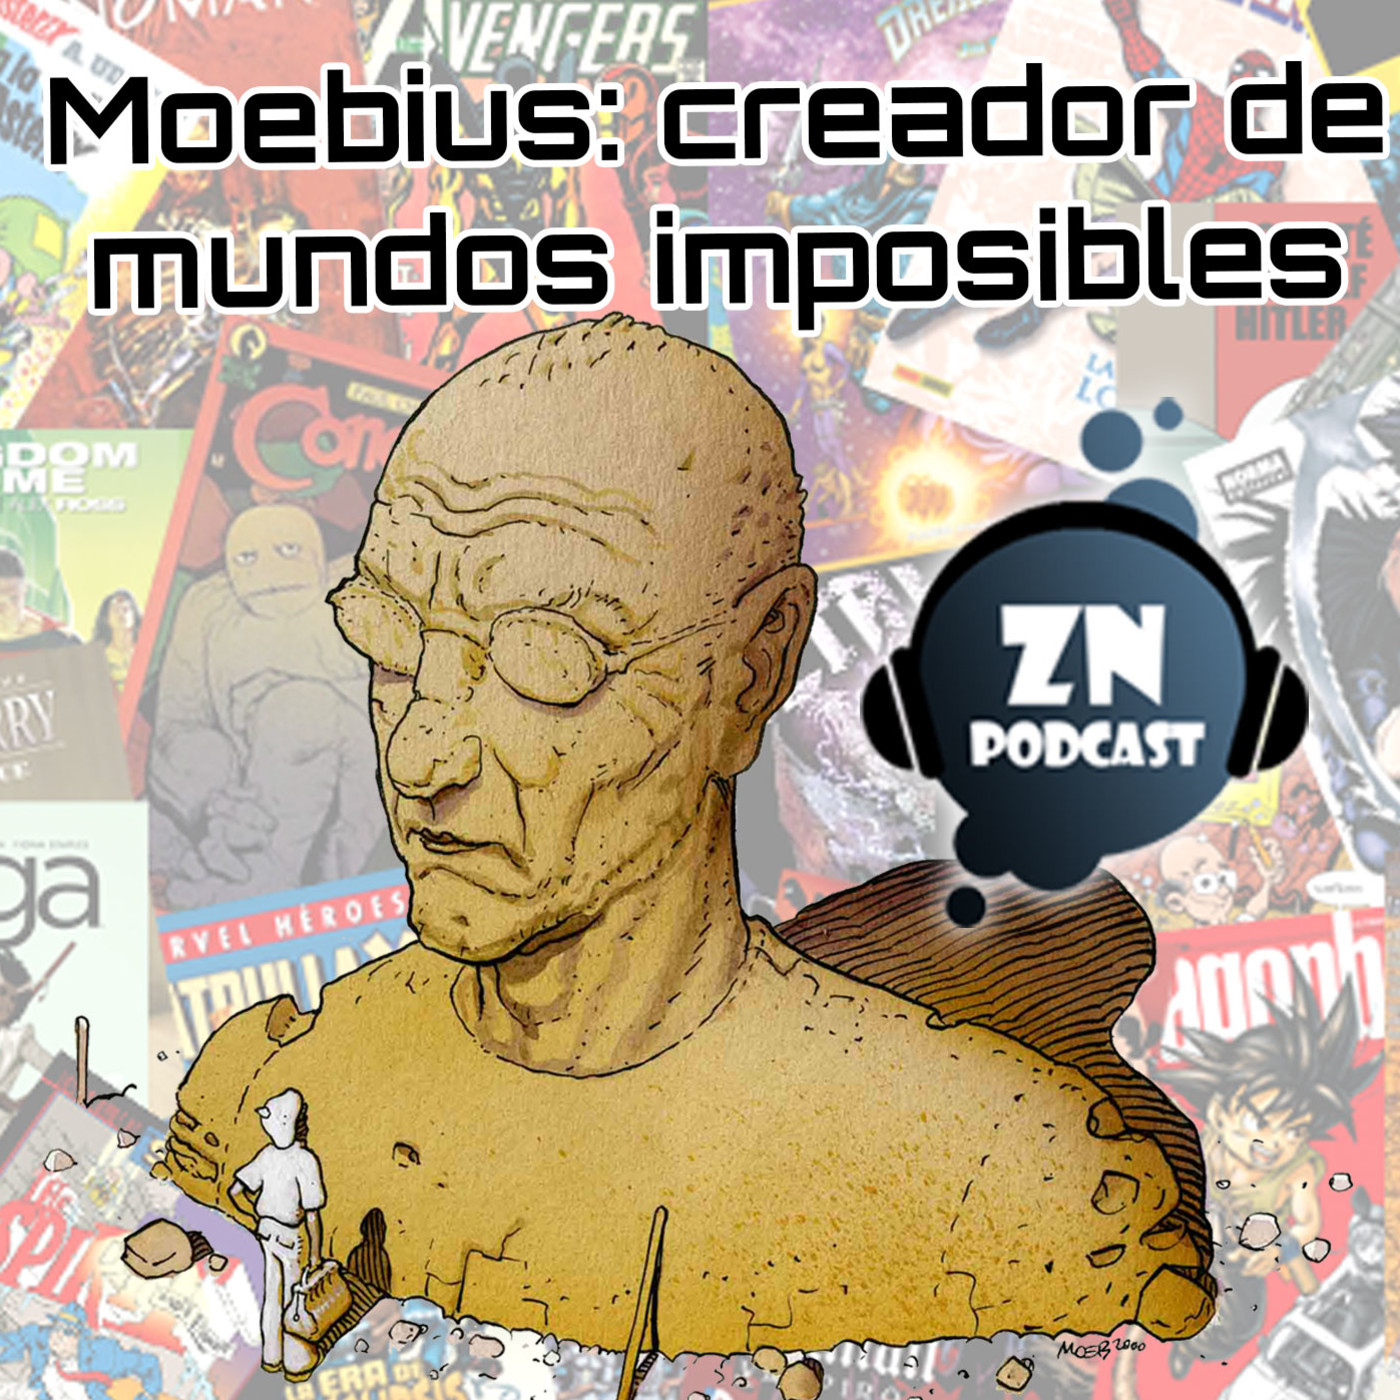 ZNPodcast #83 - Moebius: creador de mundos imposibles